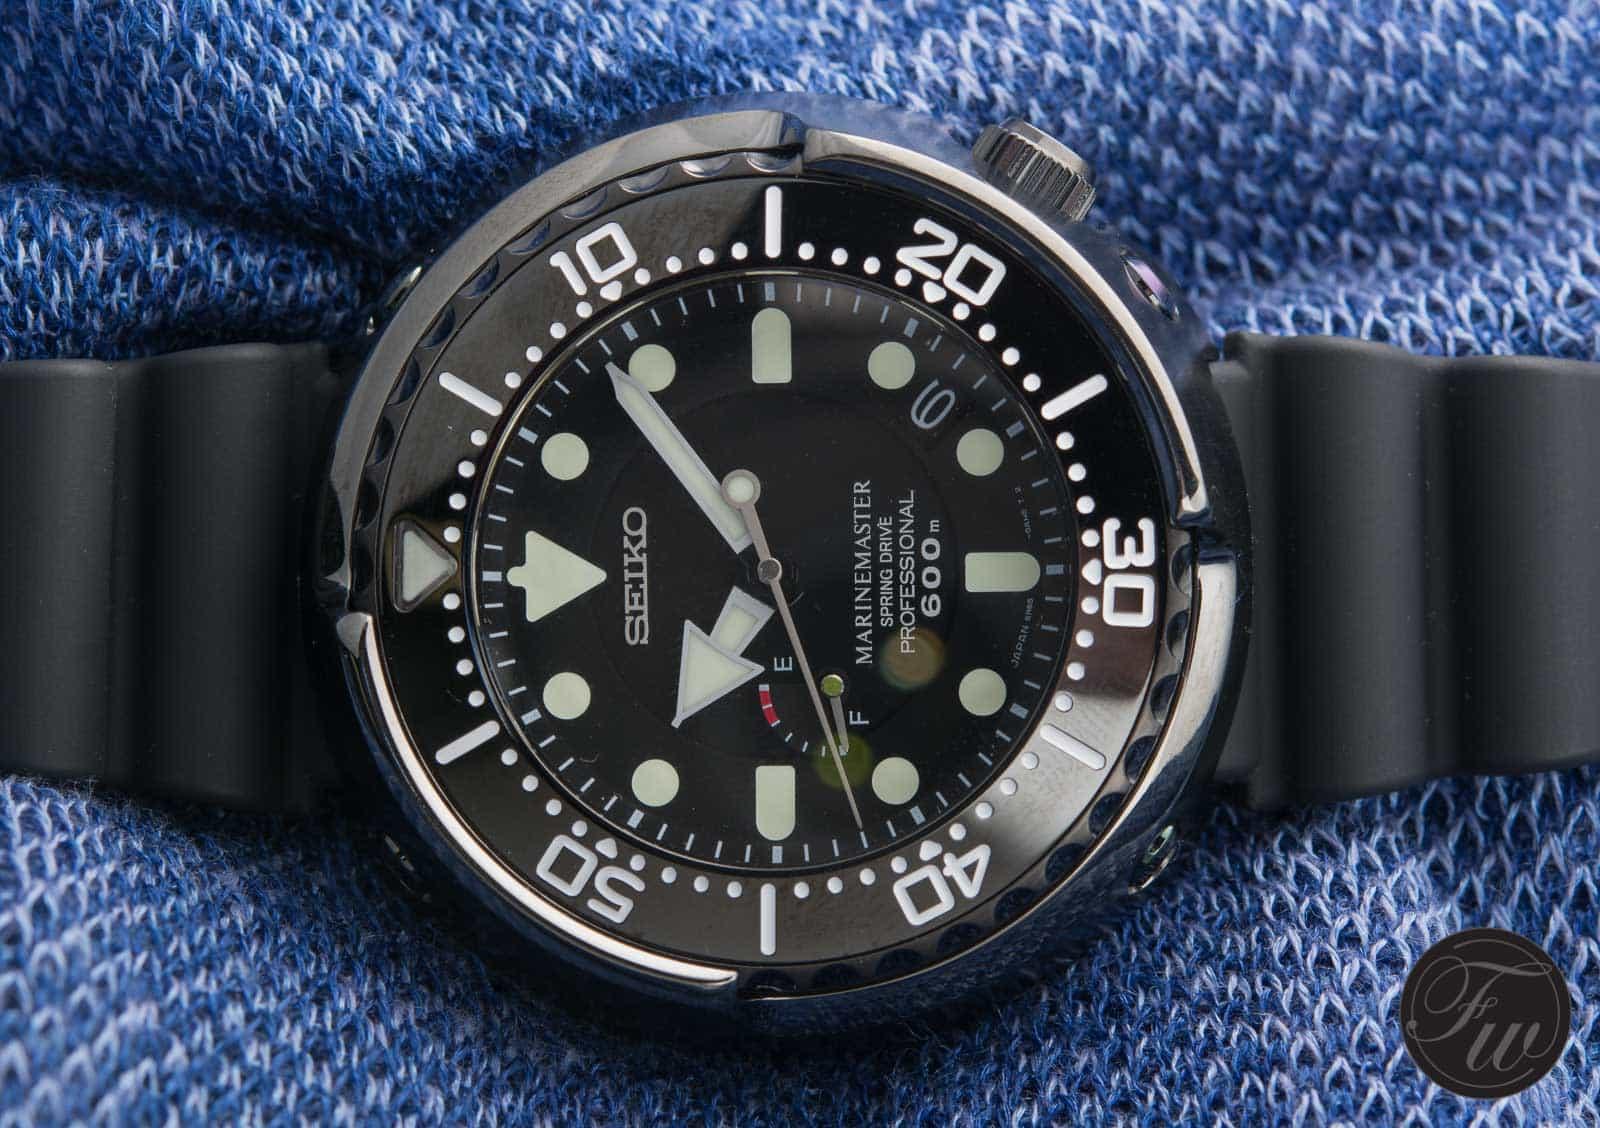 Seiko-WatchTrip-137